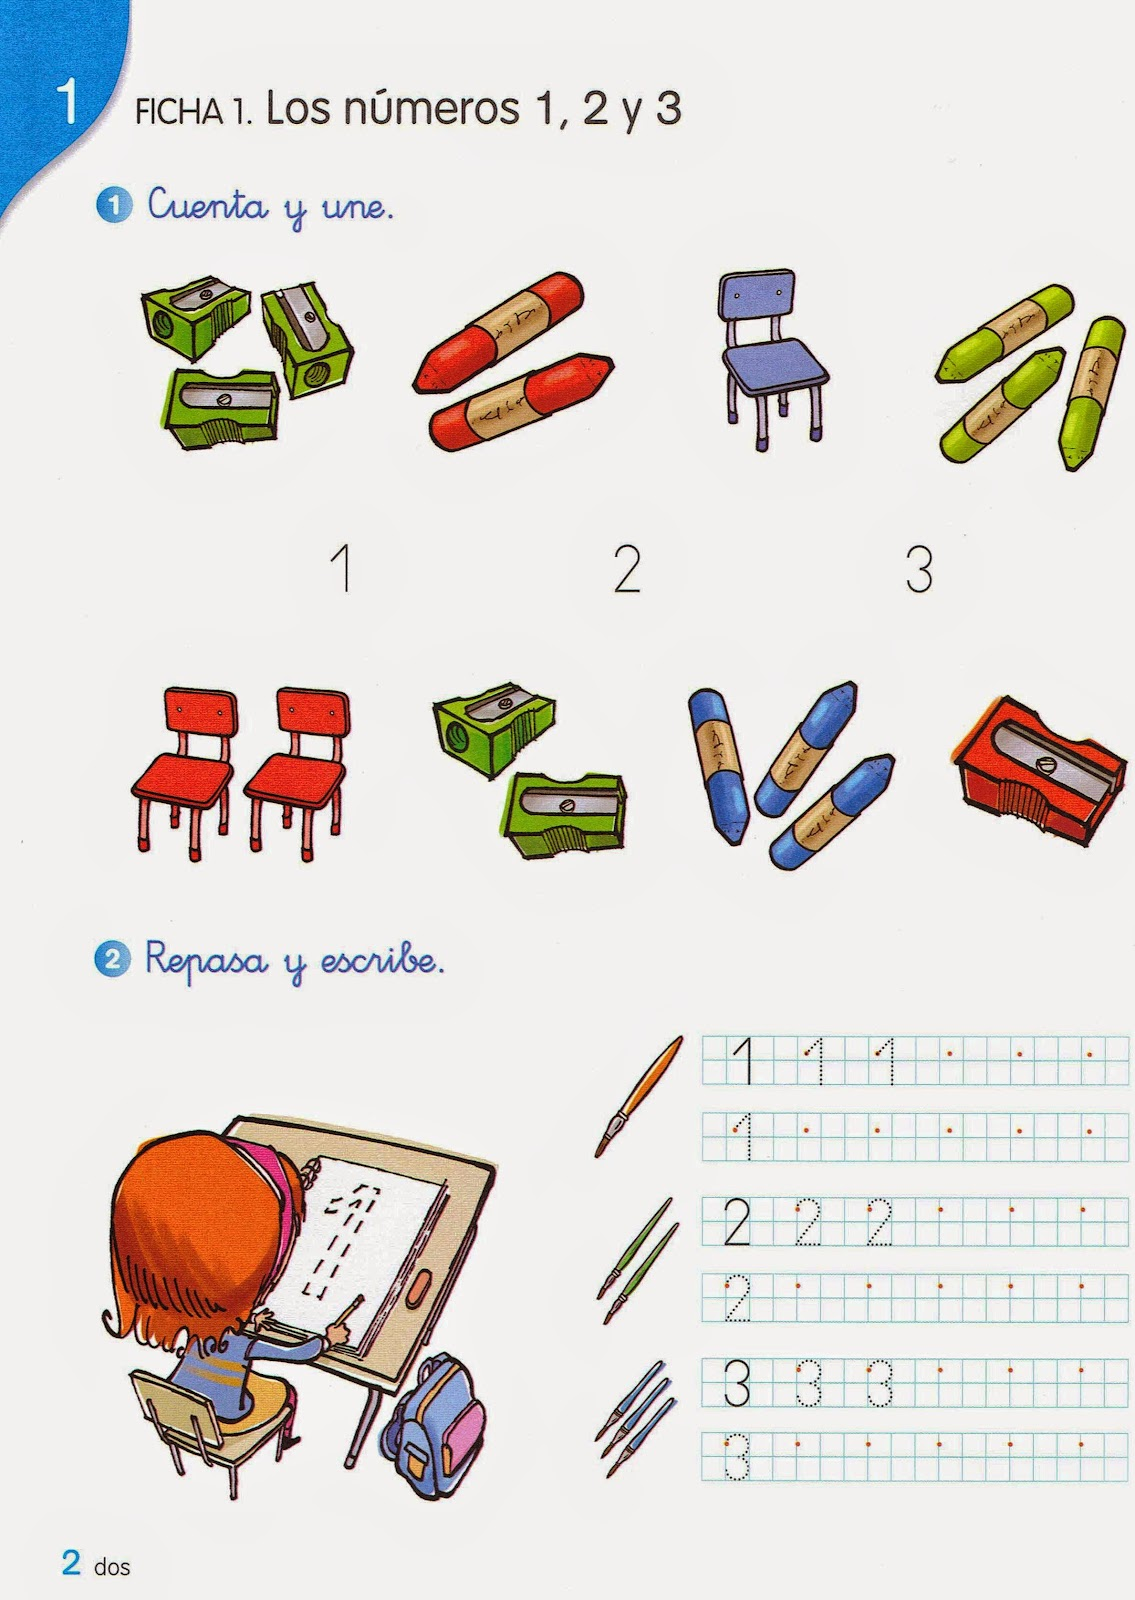 https://picasaweb.google.com/100252597810384634858/MatematicasTema1?authuser=0&feat=directlink